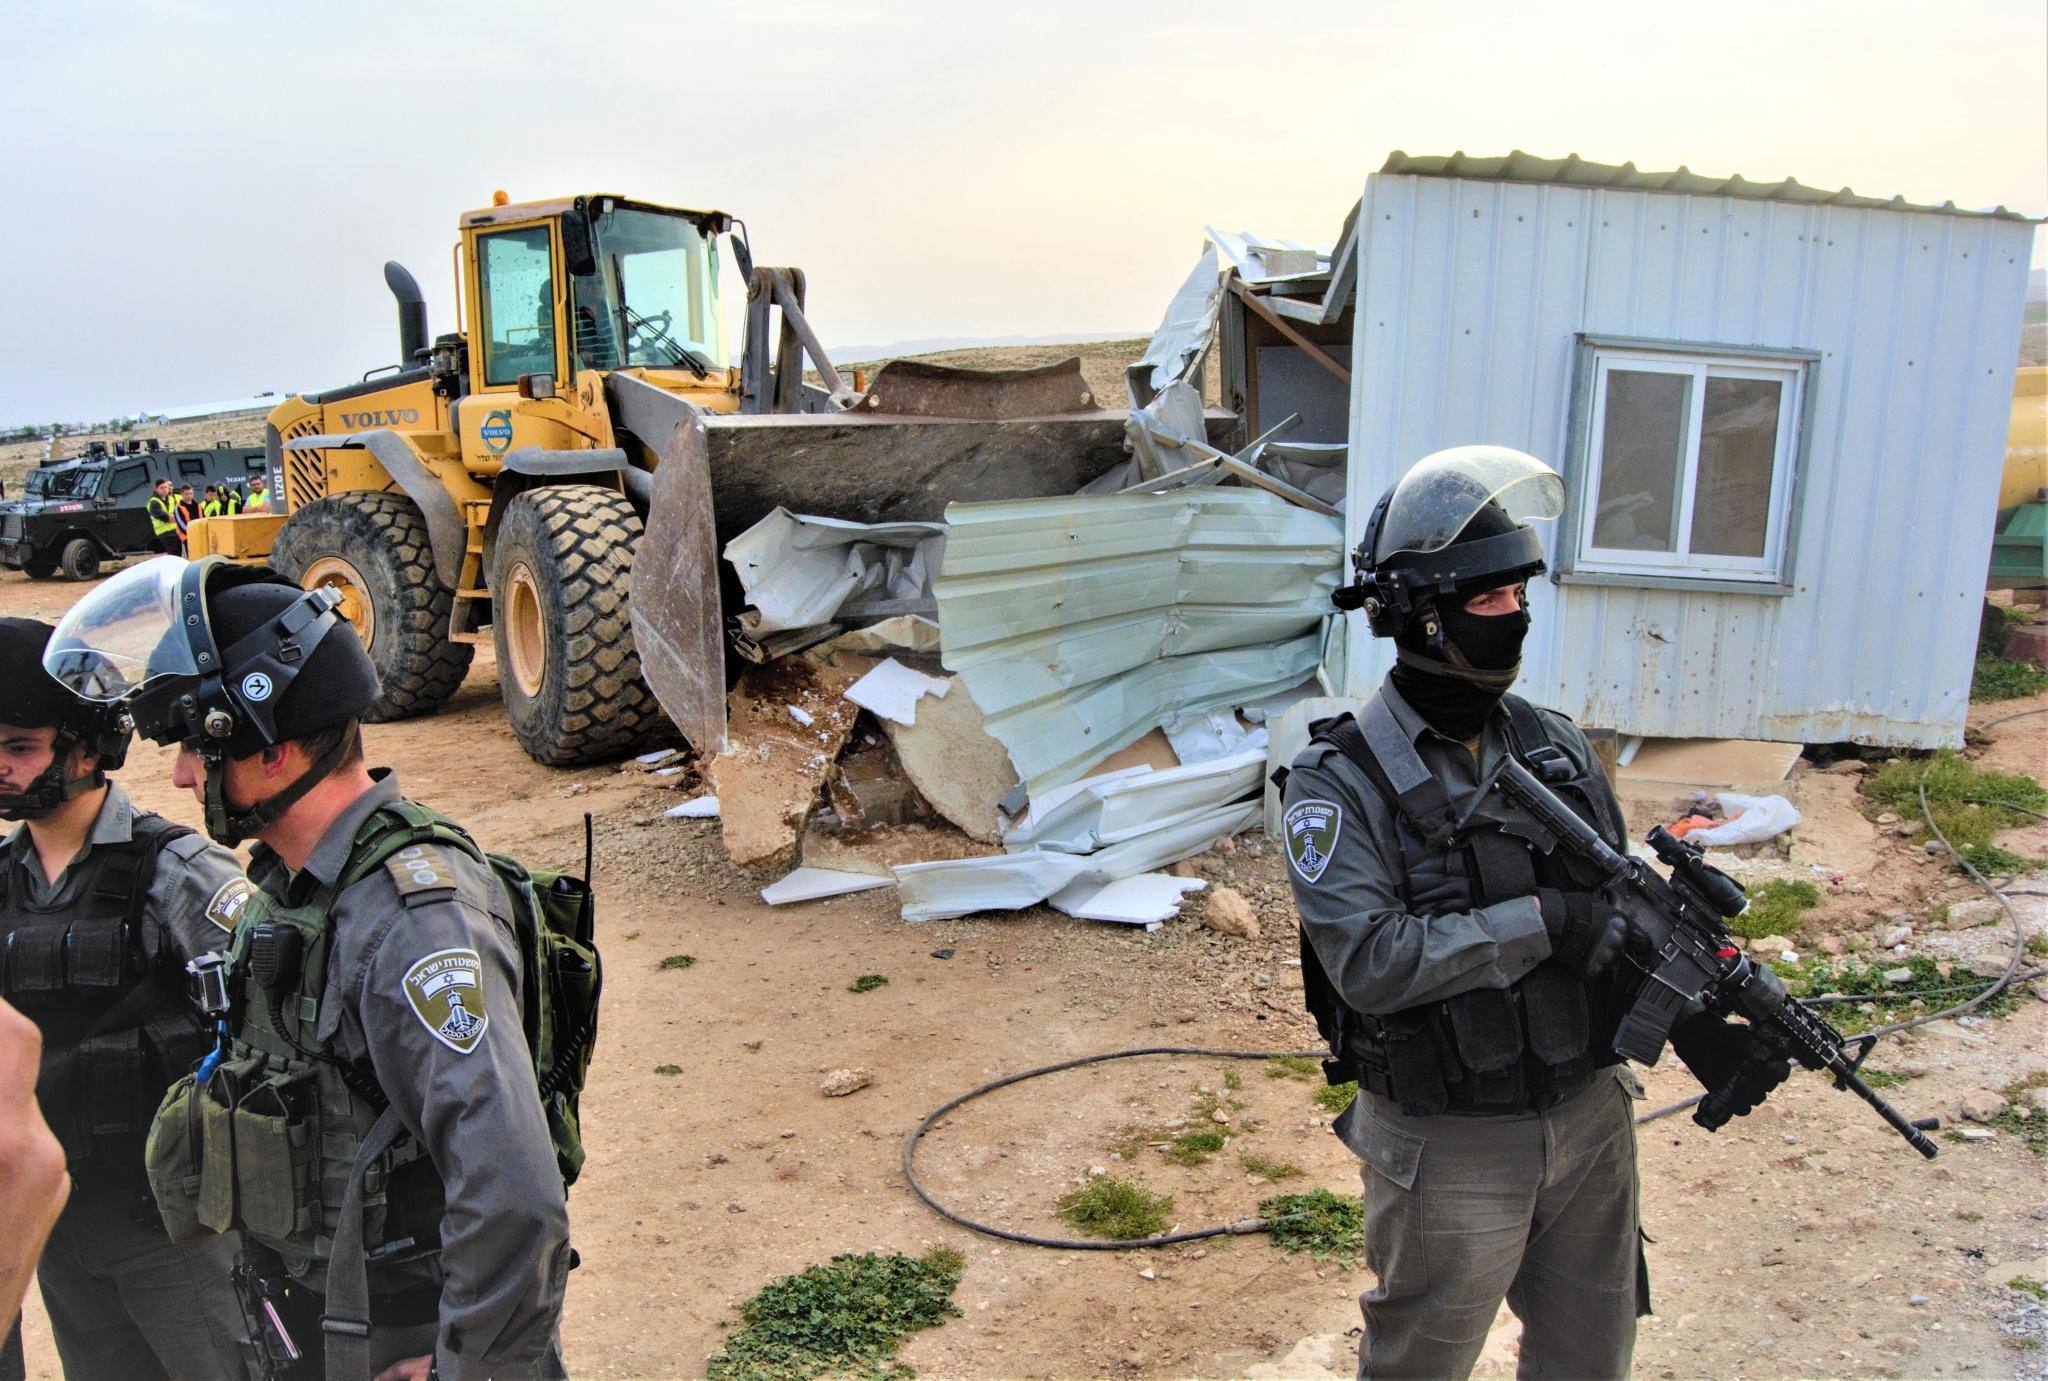 NGO Regavim – a so-called charity dedicated to demolishing